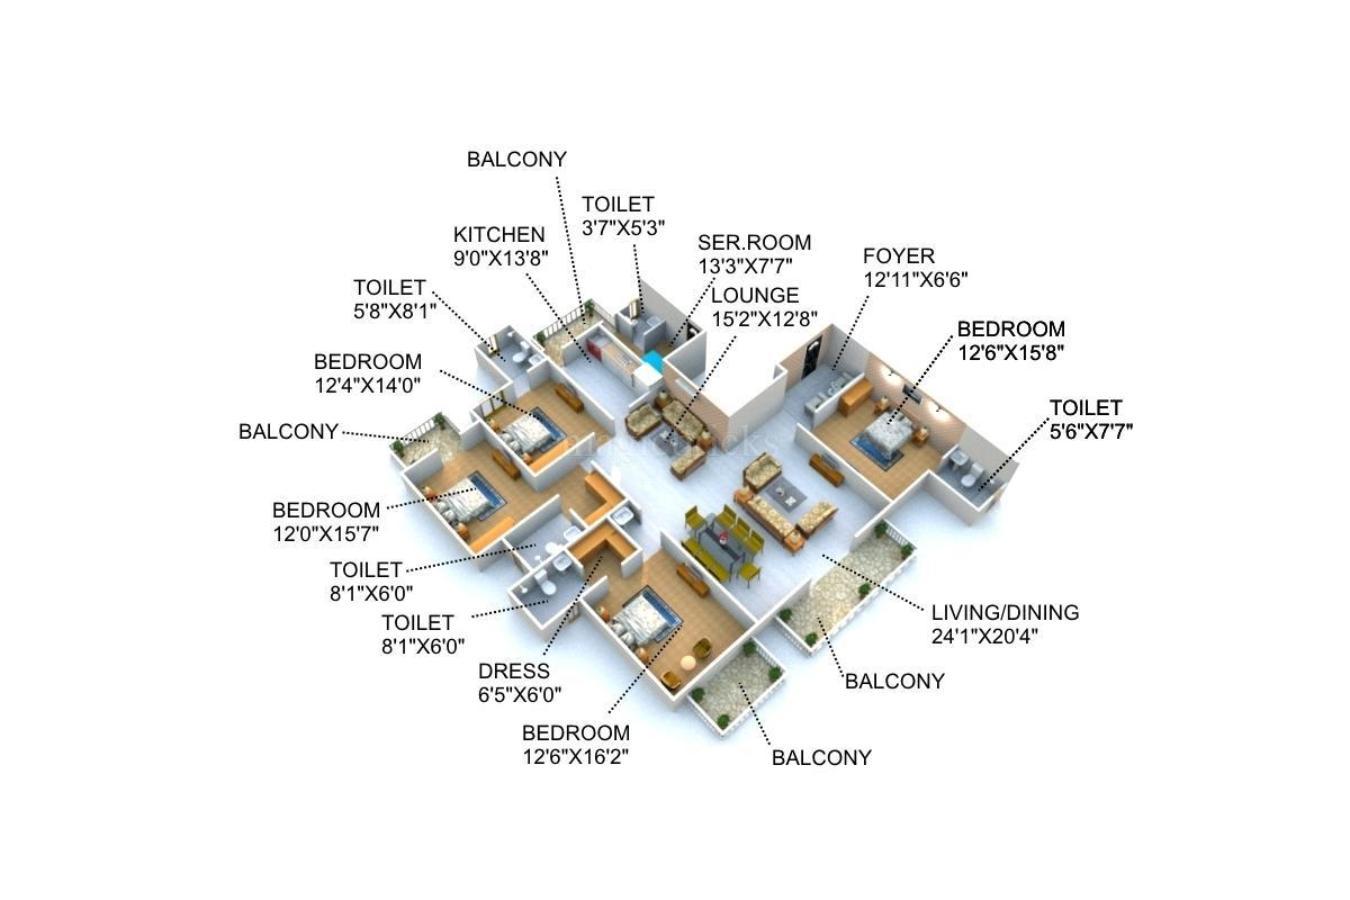 Dlf New Town Heights Floor Plan Remarkable design kitchen New in House Designer Room